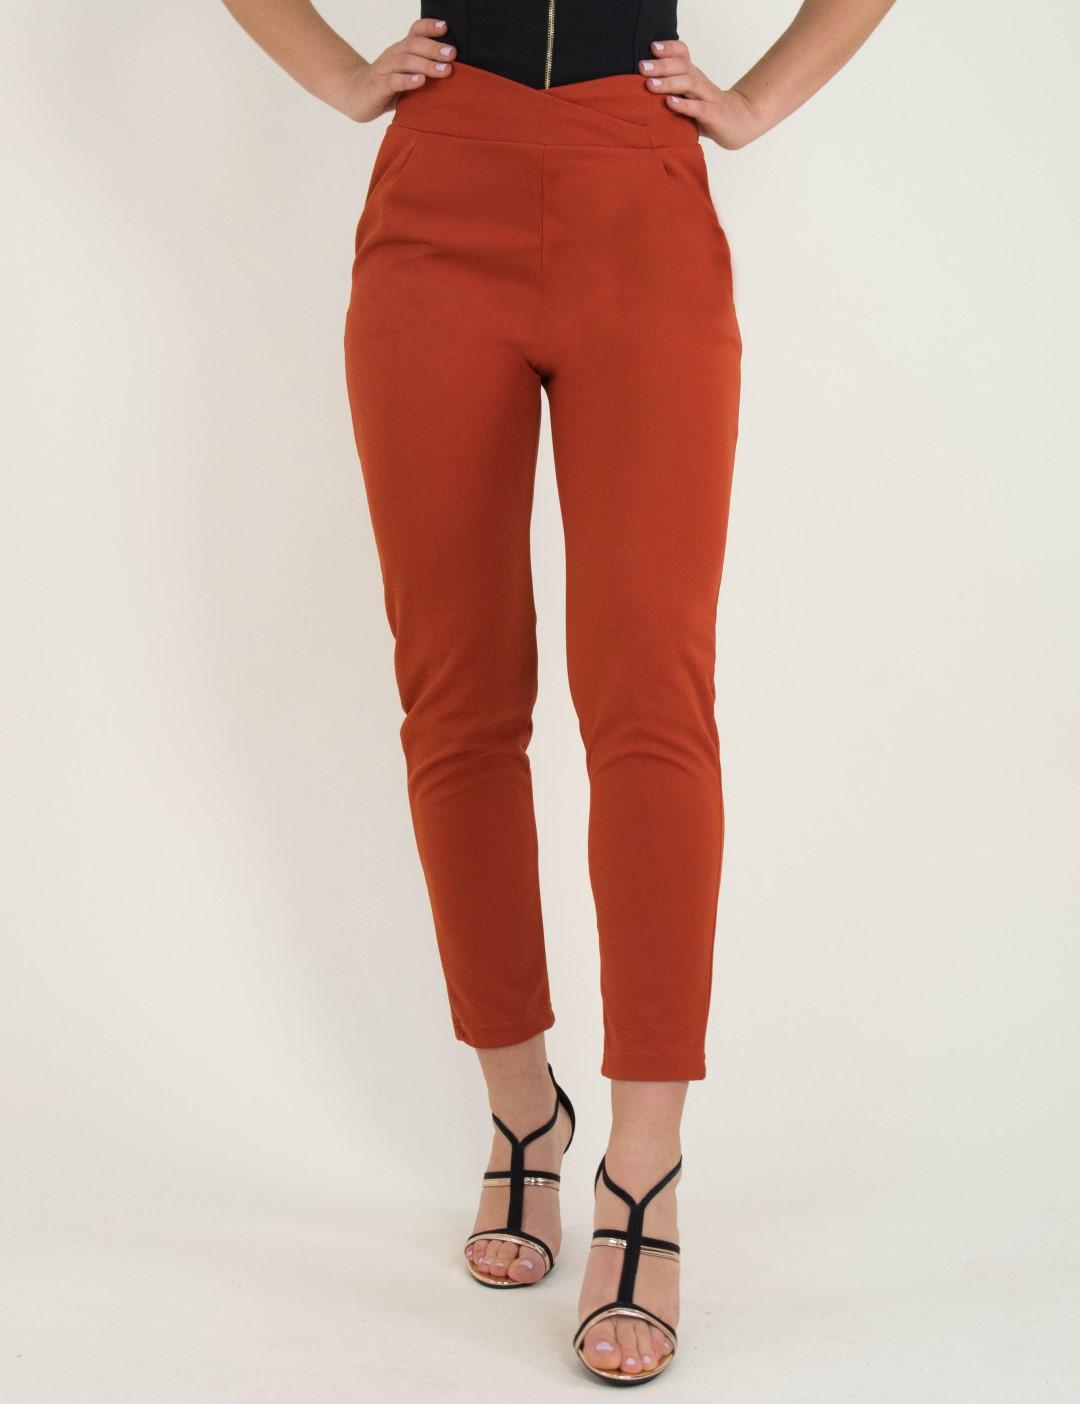 6218b2764815 Γυναικείο εκάι ψηλόμεσο παντελόνι με τσέπες So Sexy 41148B